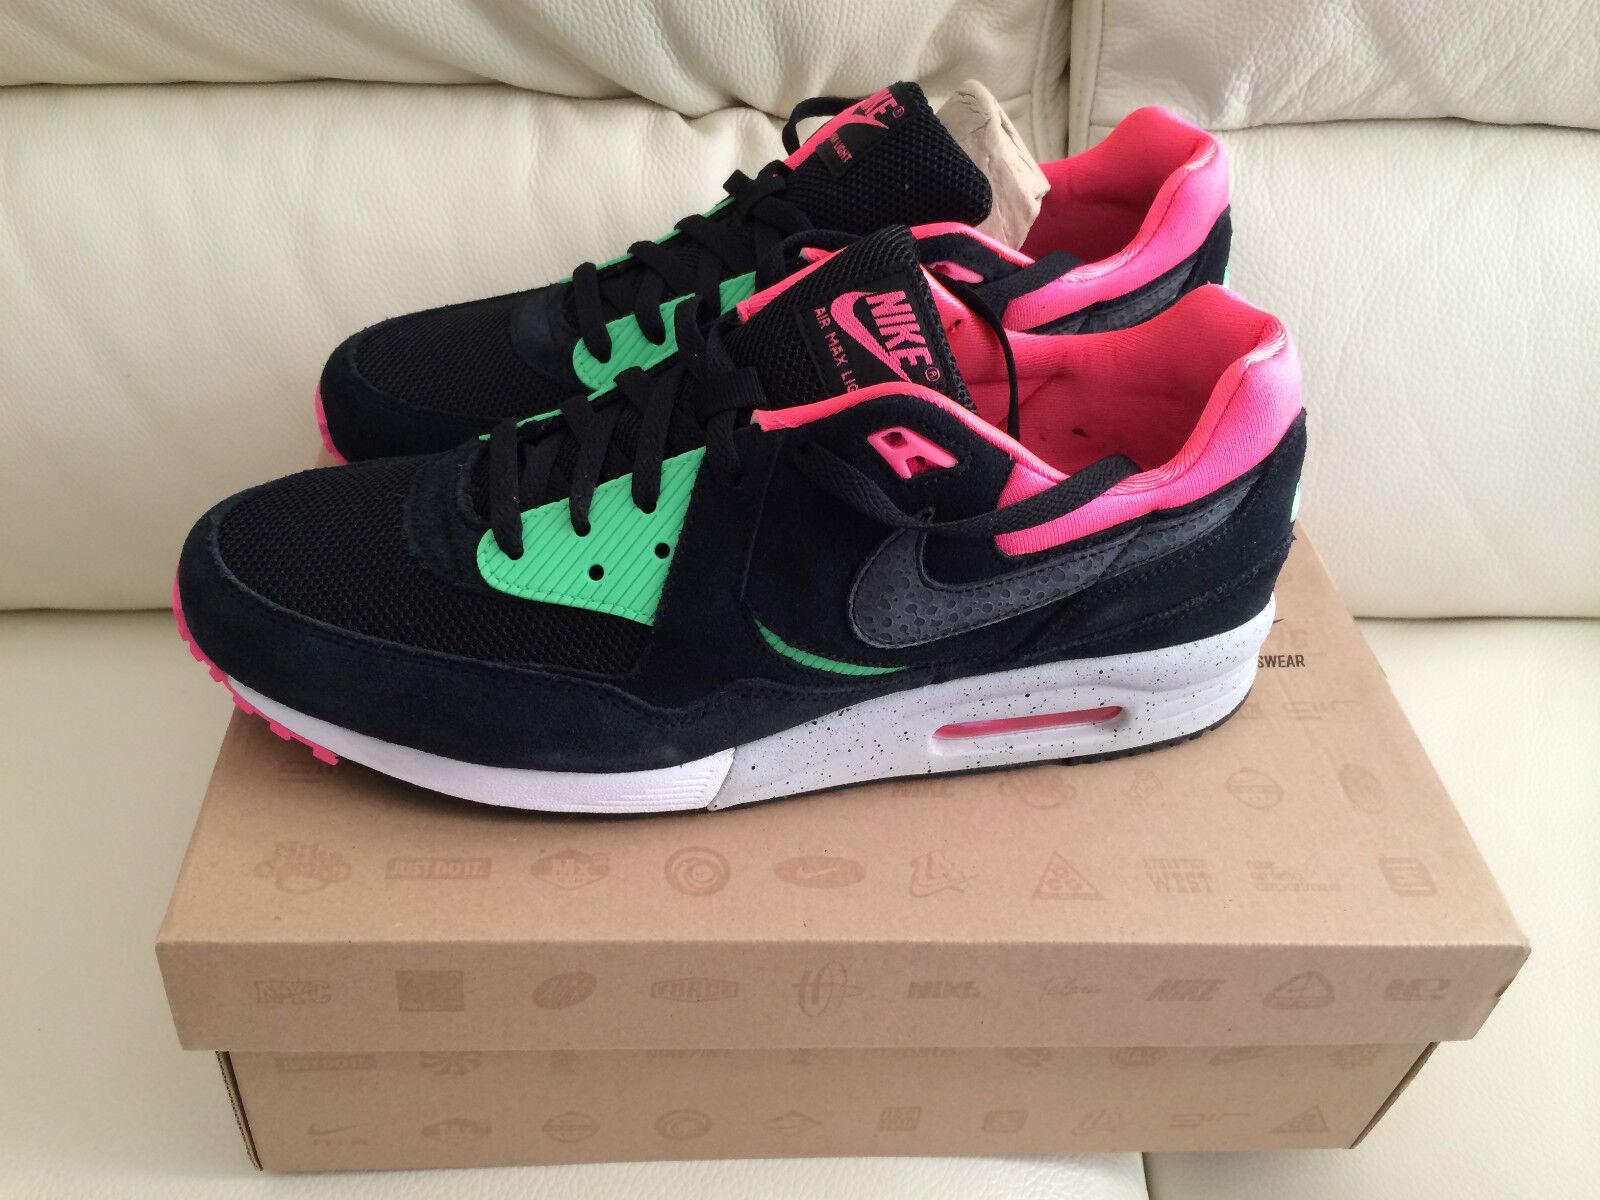 Nike air max light le b Entrainement Baskets Noir / Vert / Rose 10 brand new look ** **